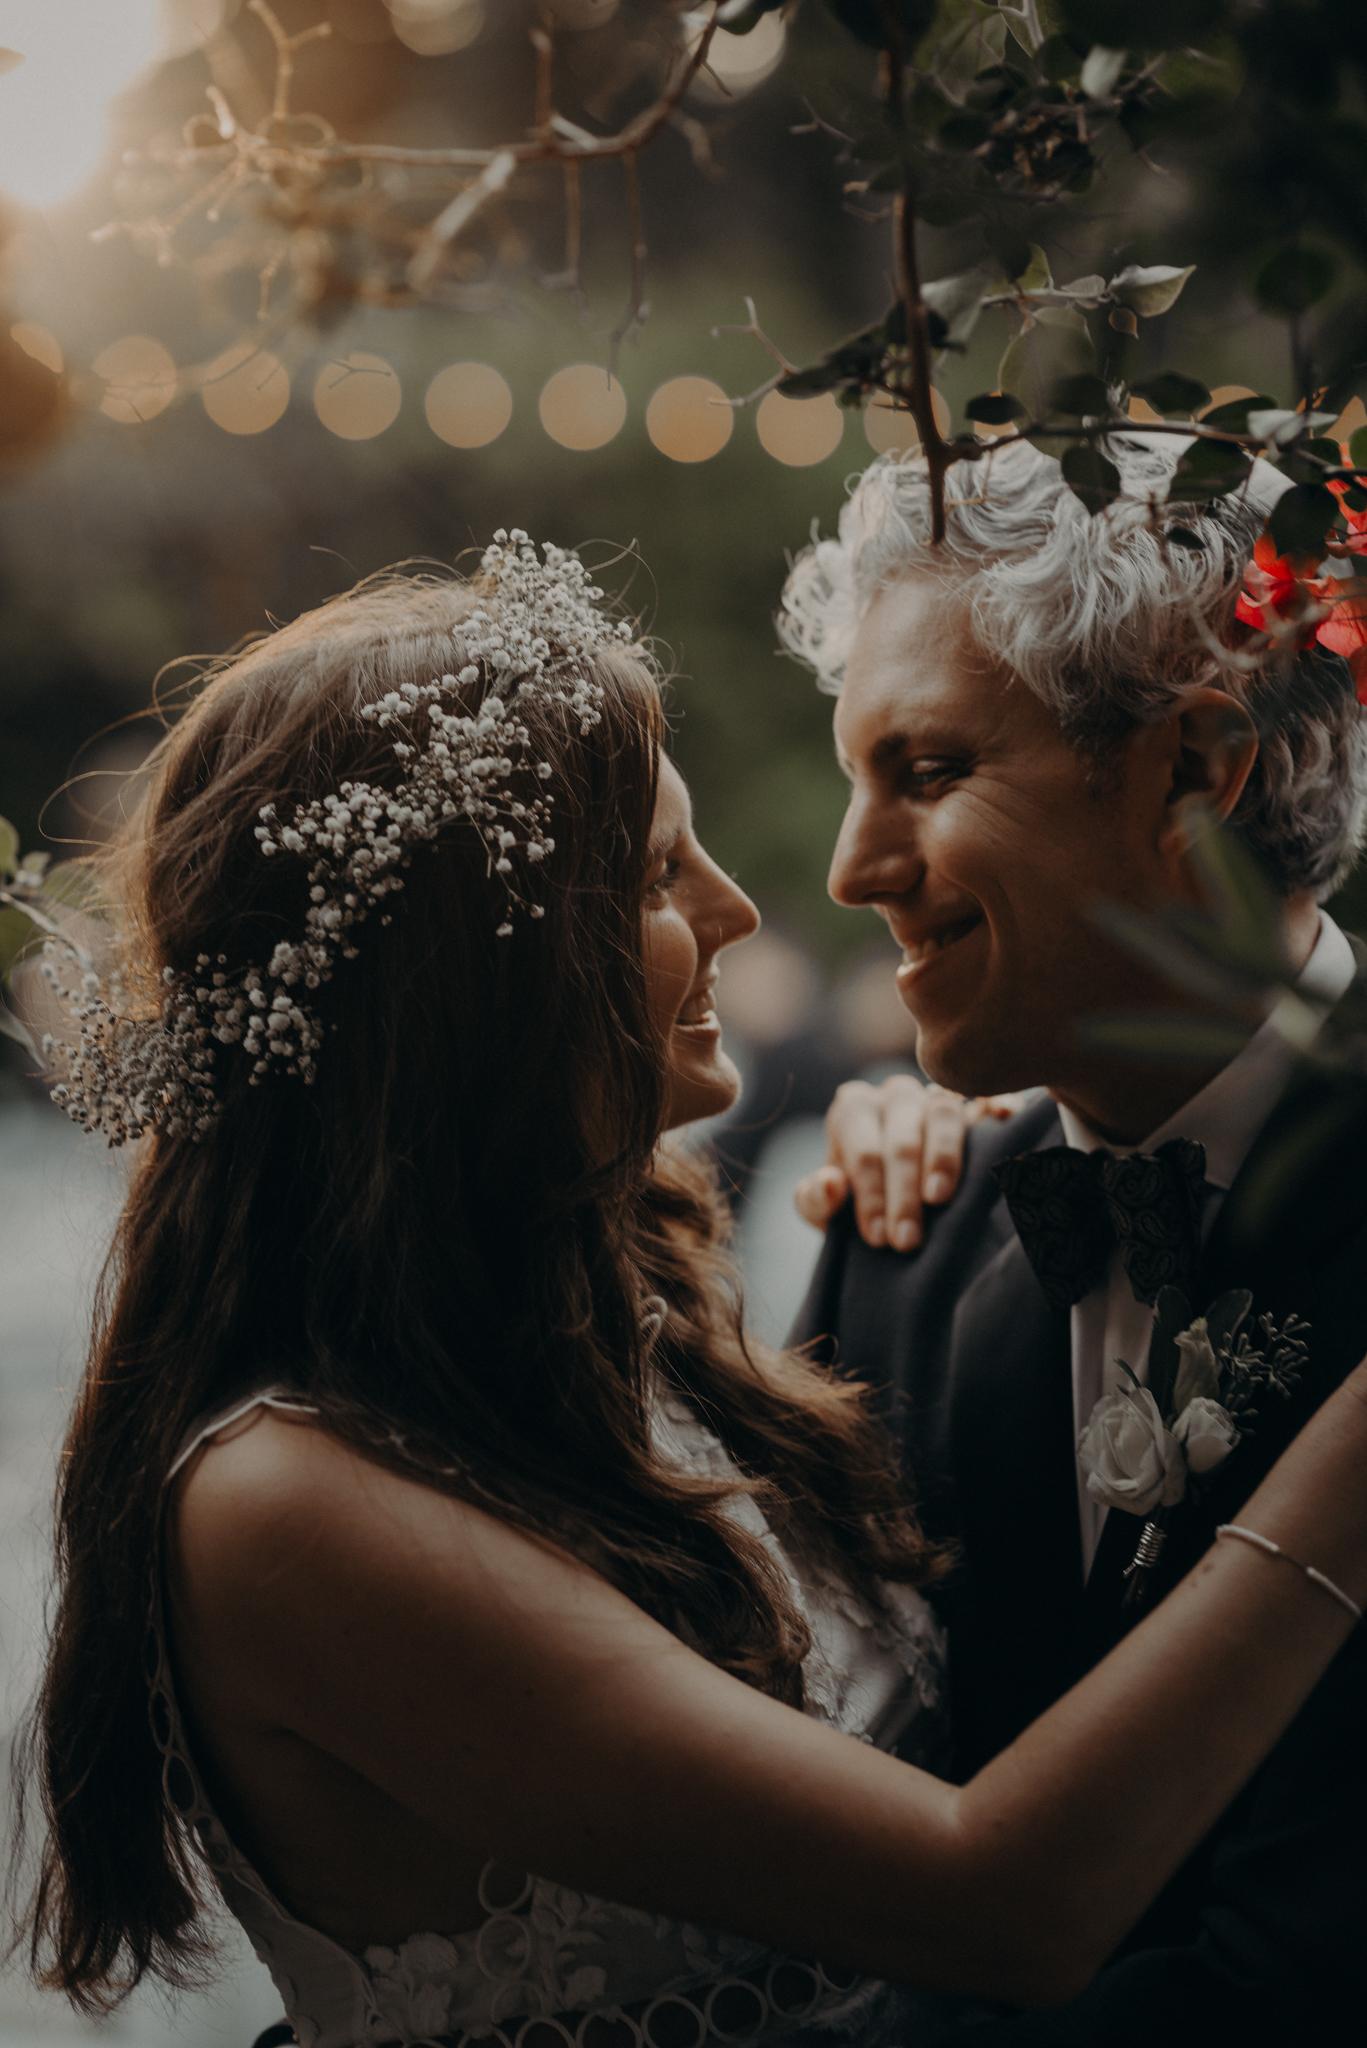 Isaiah + Taylor Photography - Private Estate Backyard Wedding - Beverly Hills - Los Angeles Wedding Photographer - 89.jpg